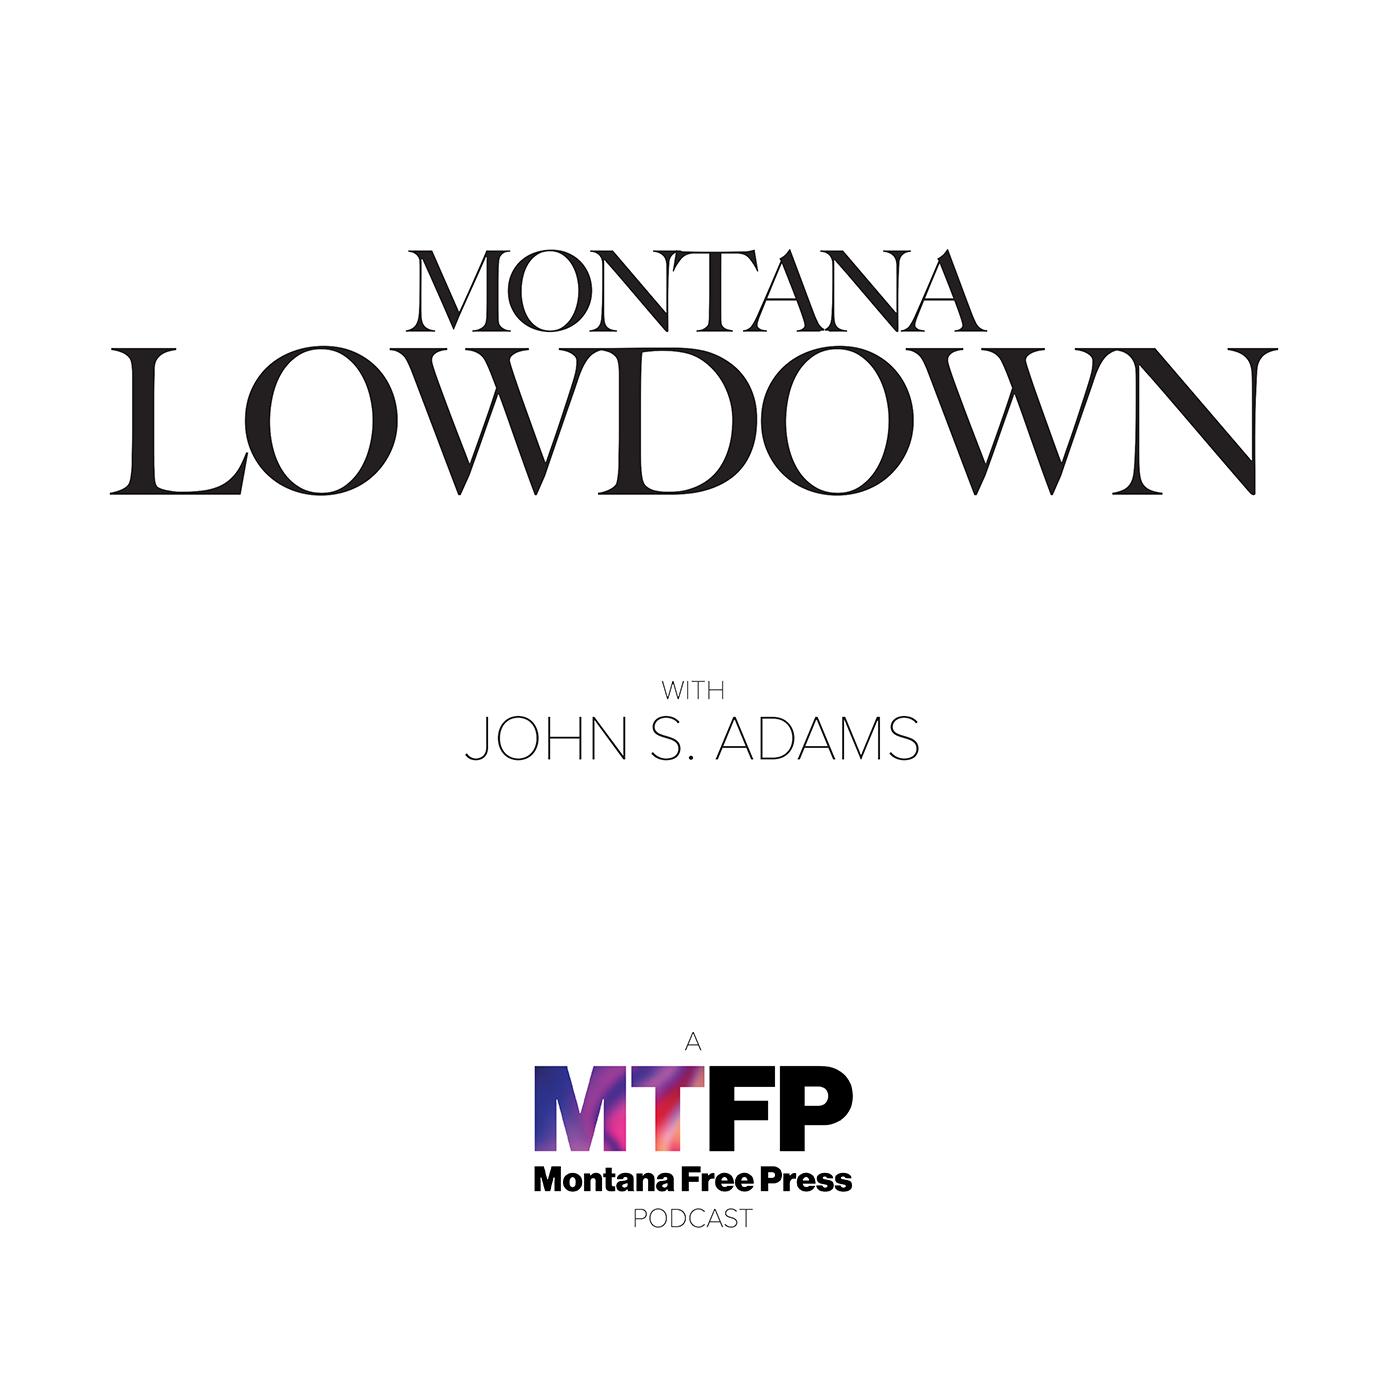 Artwork for Montana gubernatorial candidate Al Olszewski